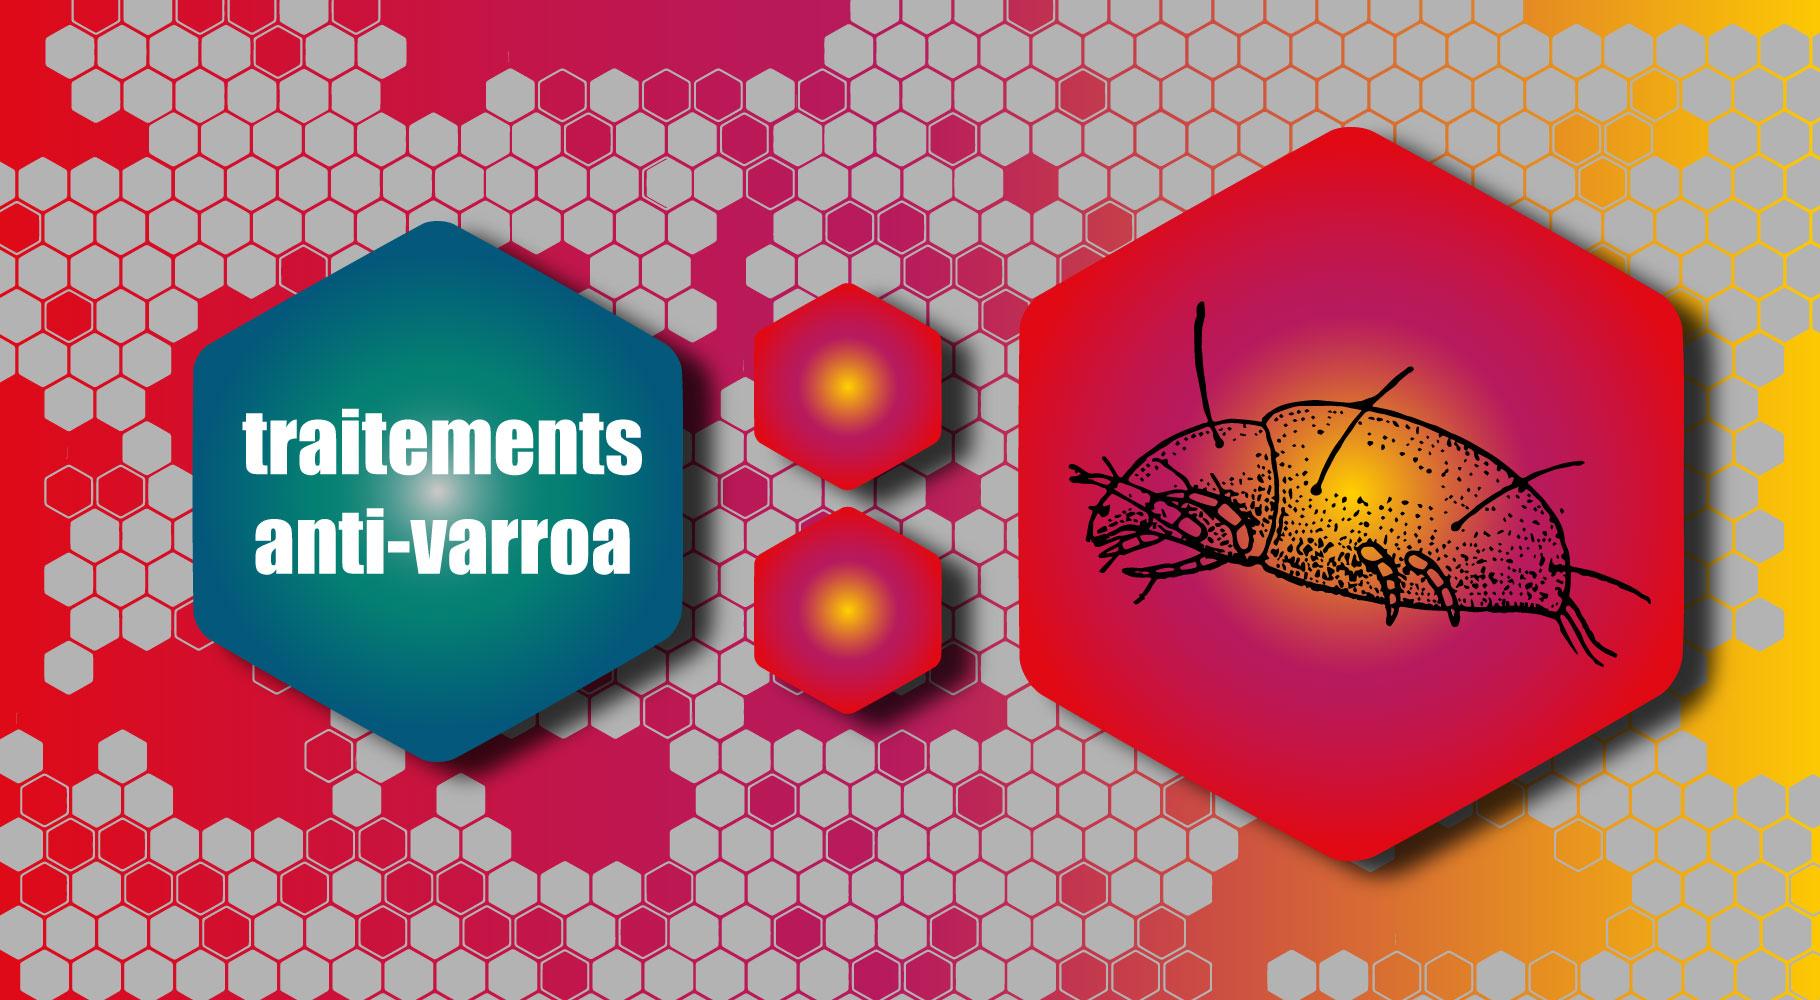 Traitements anti-varroa